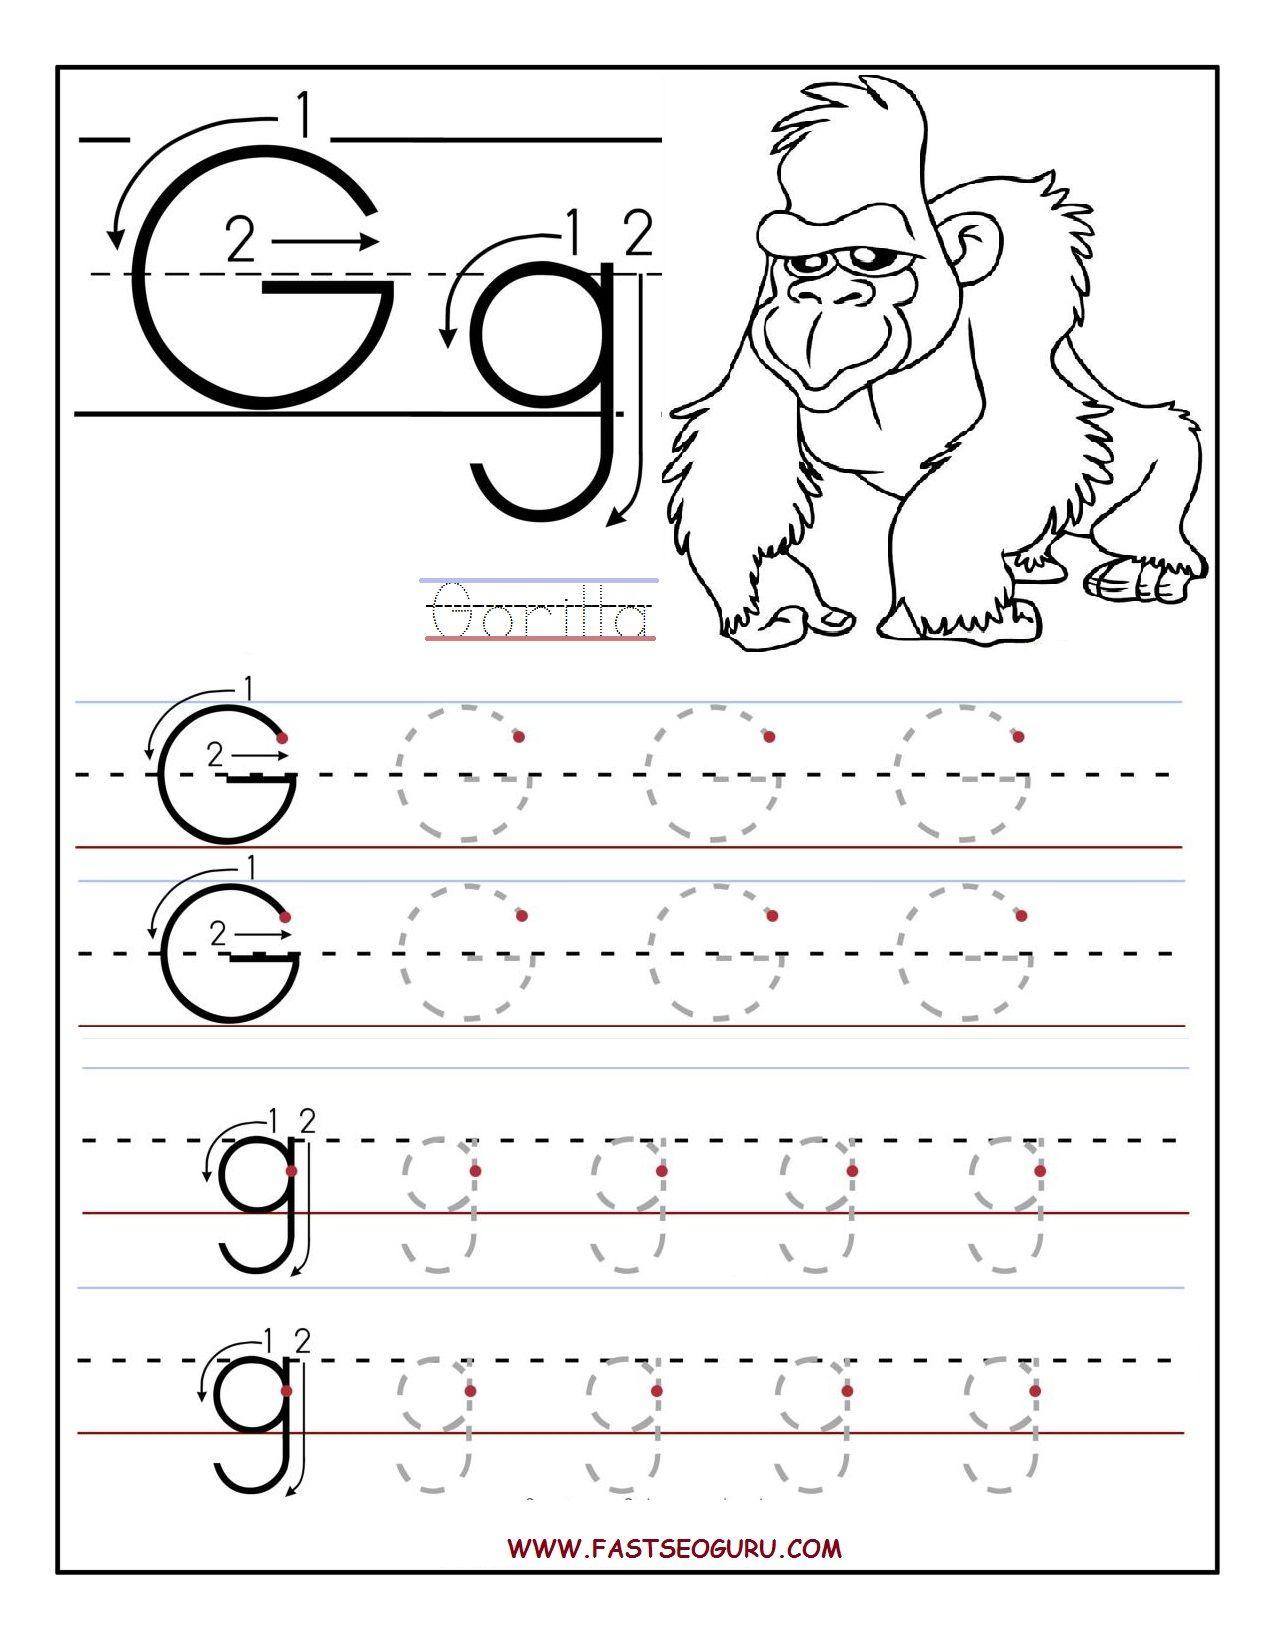 Tracing Letter G Worksheets